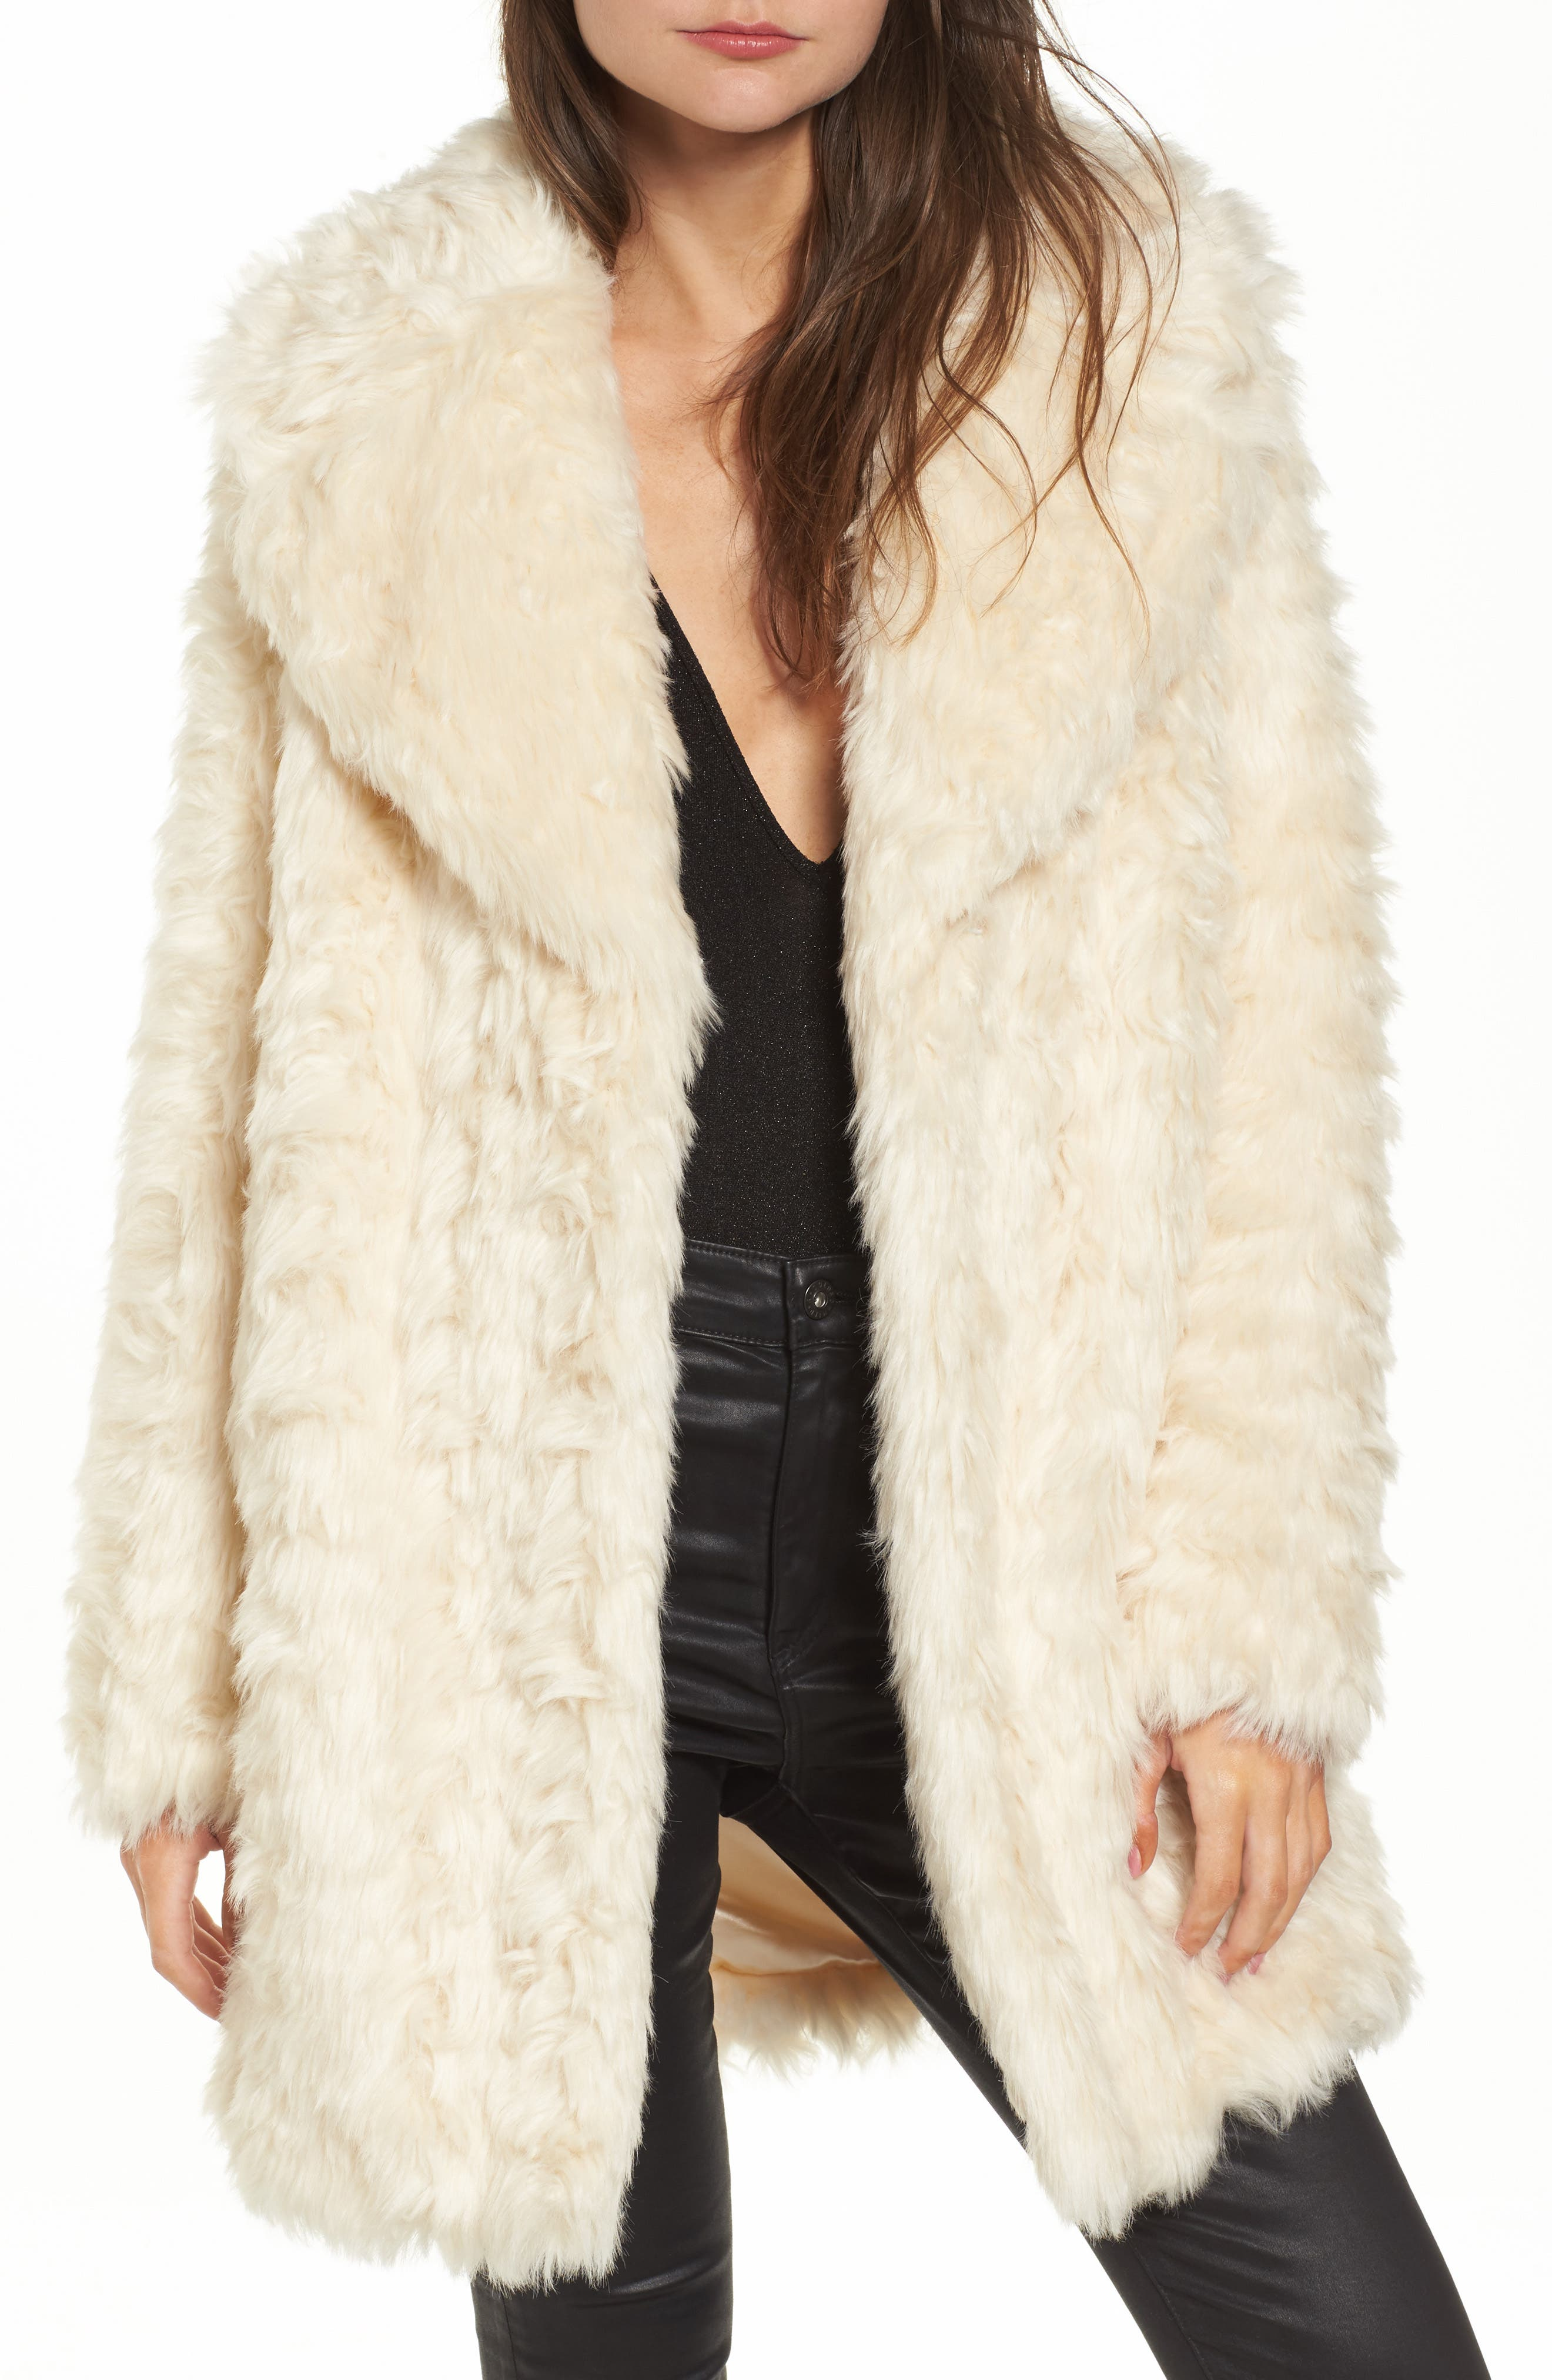 Curly Faux Fur Coat,                             Main thumbnail 1, color,                             900